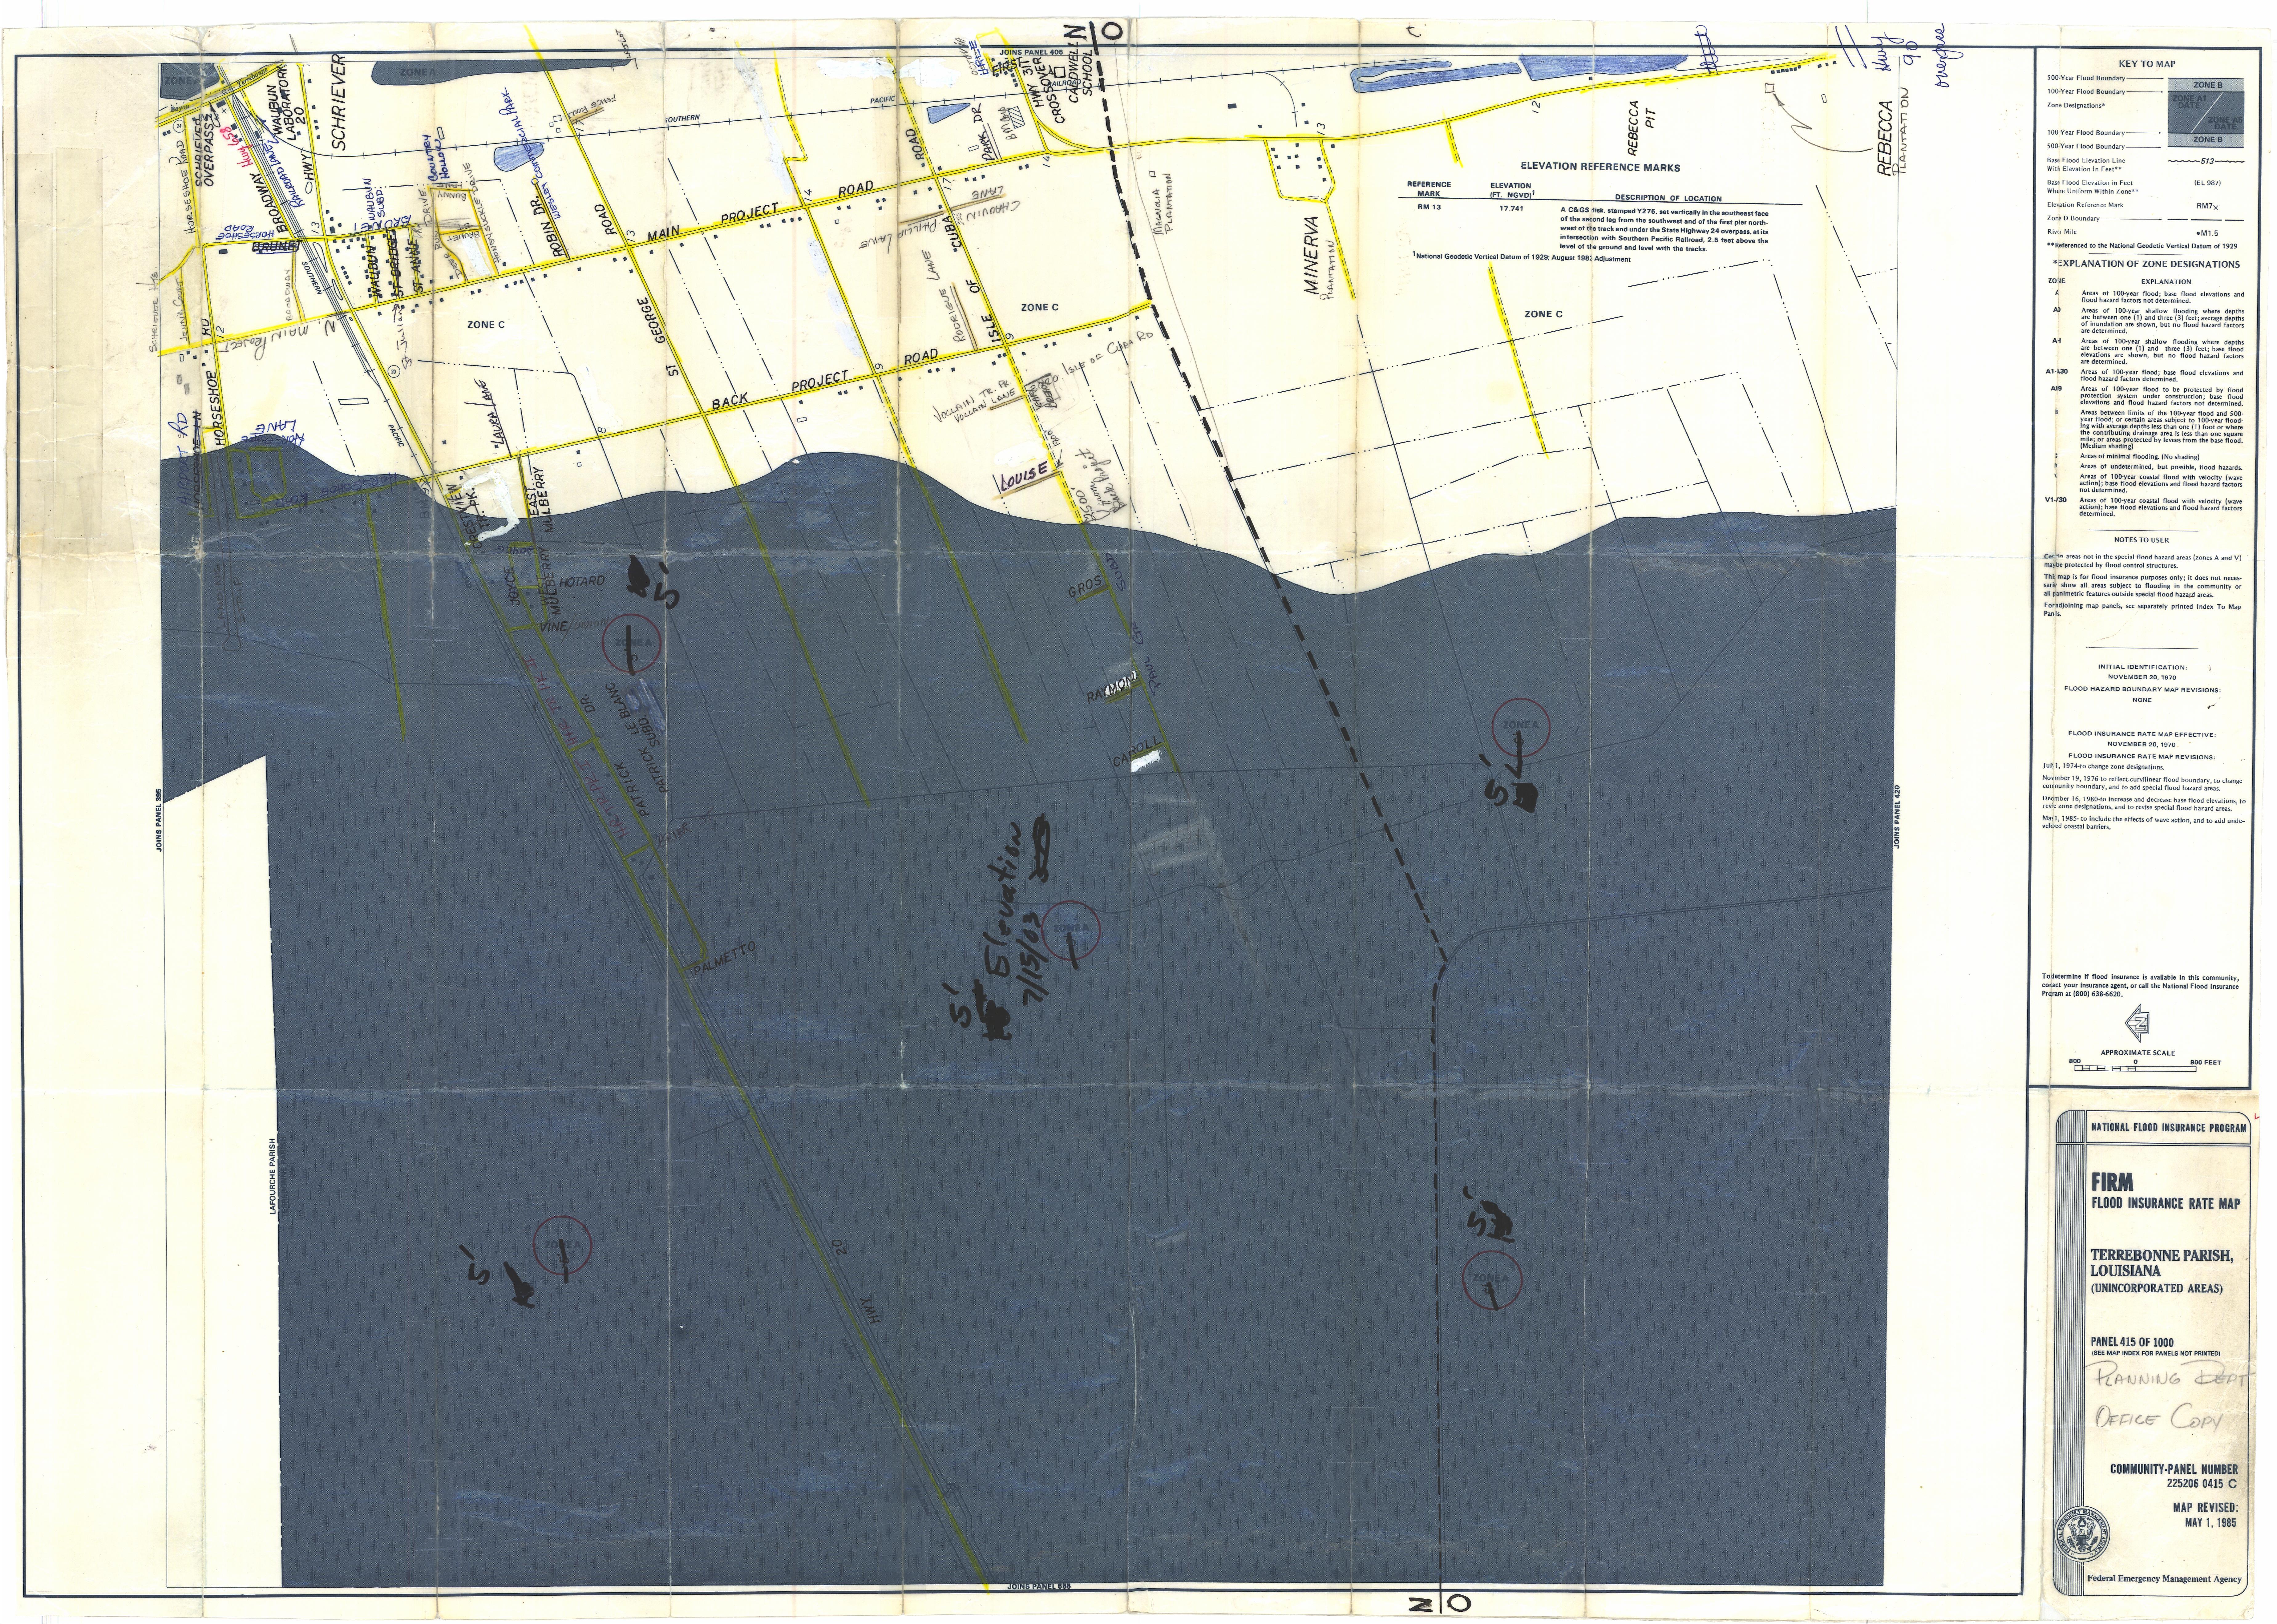 Flood Maps FIRM - Fema firm maps gis